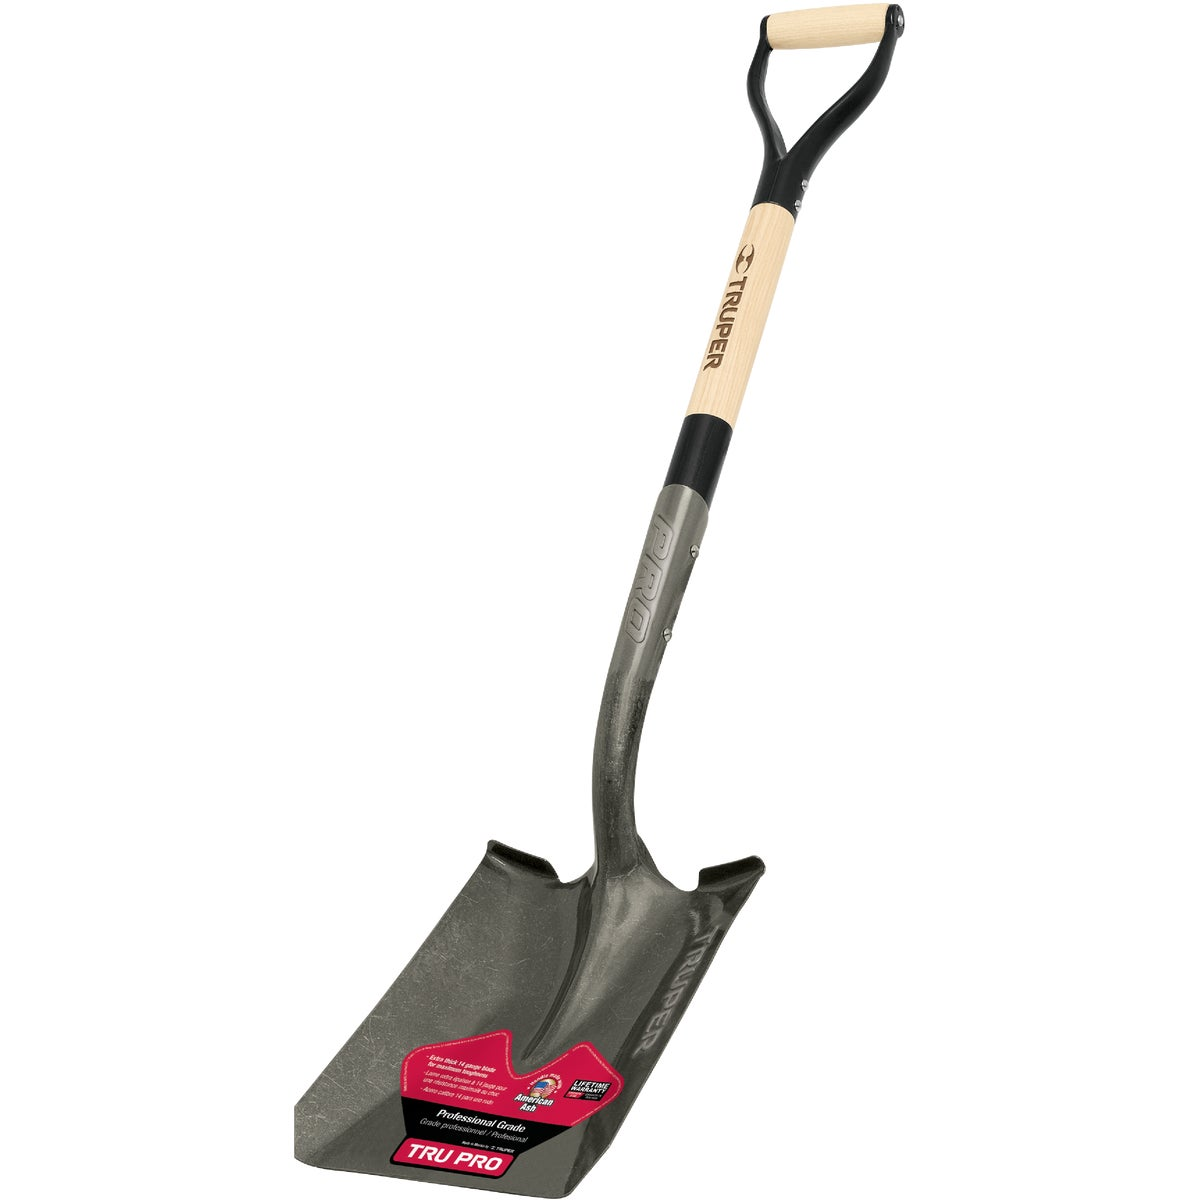 D-Hdl Sq Pt Shovel